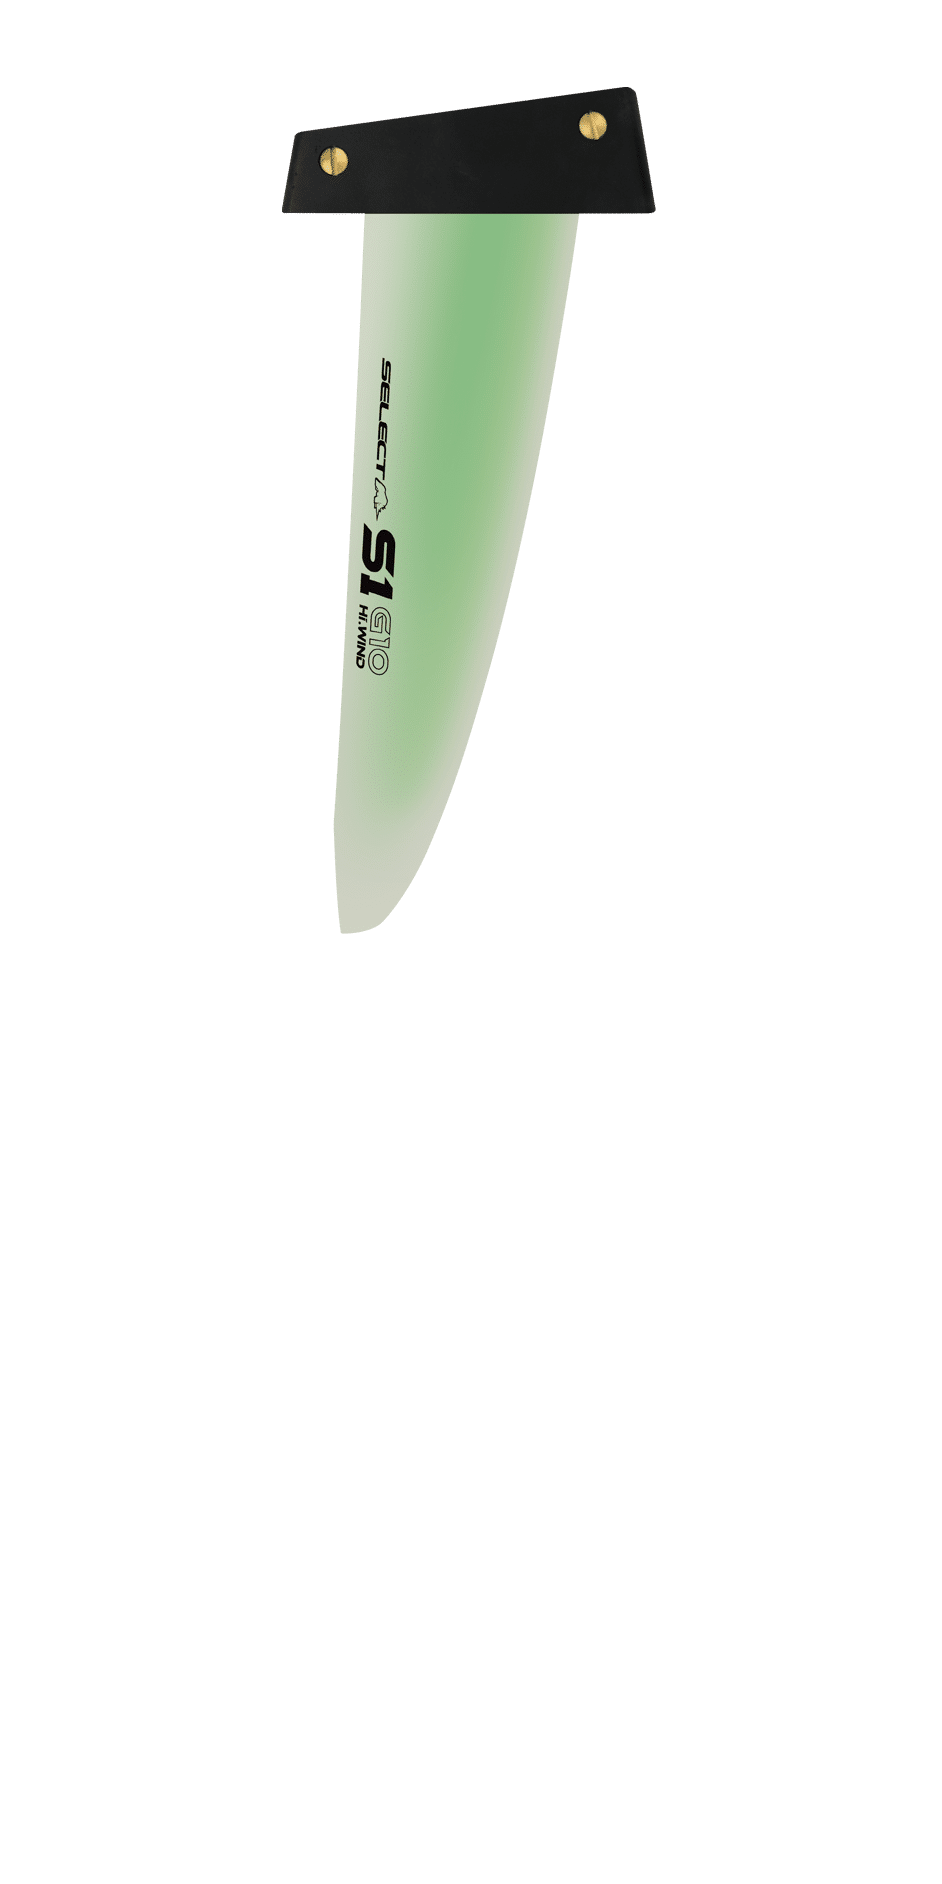 S1 Hi-Wind G10